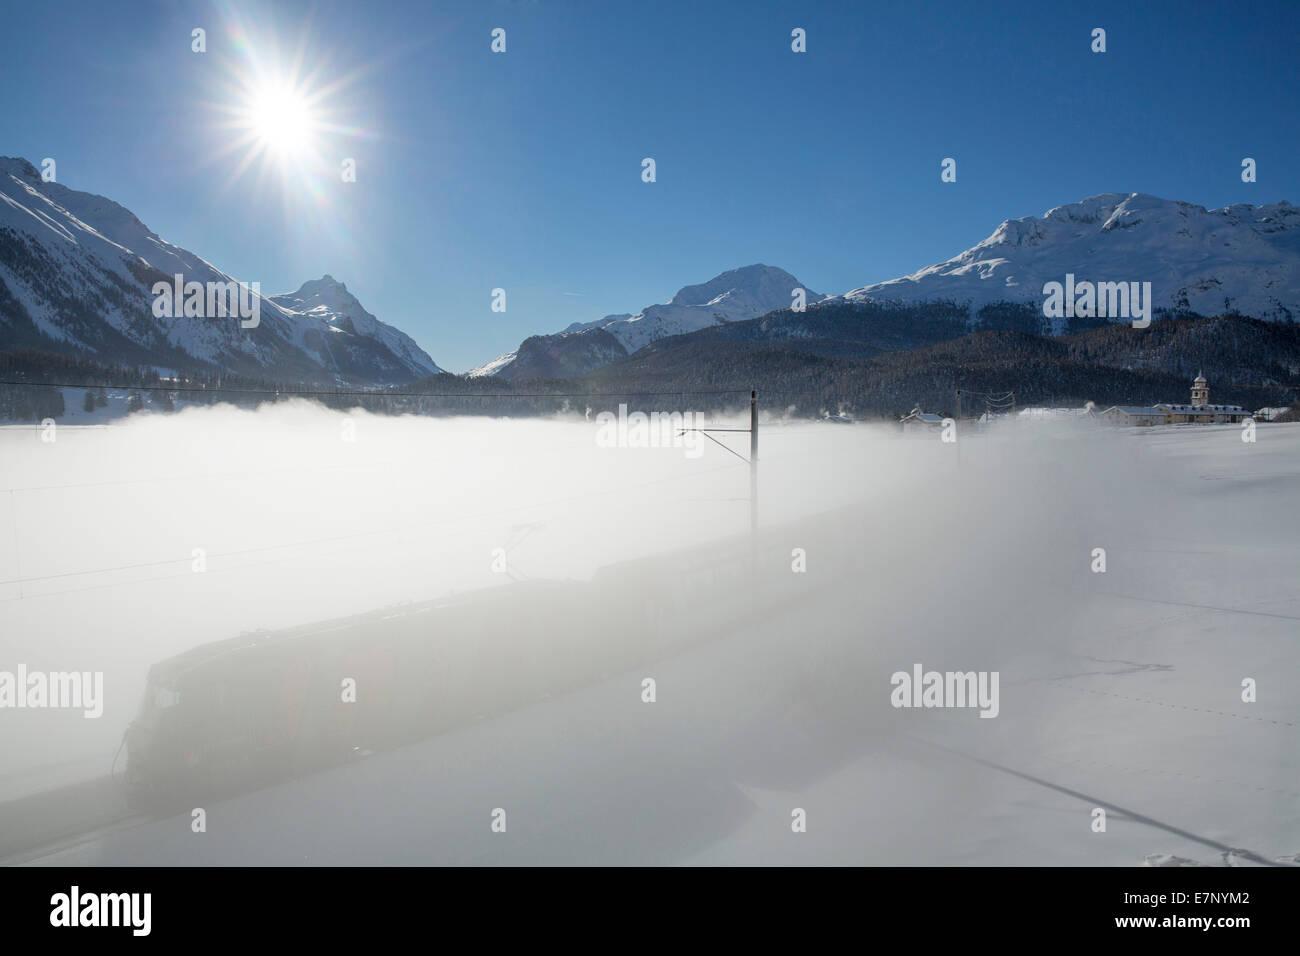 Engadin, Engadine, RHB Glacier express, Celerina, Inn, winter, canton, GR, Graubünden, Grisons, Upper Engadine, - Stock Image